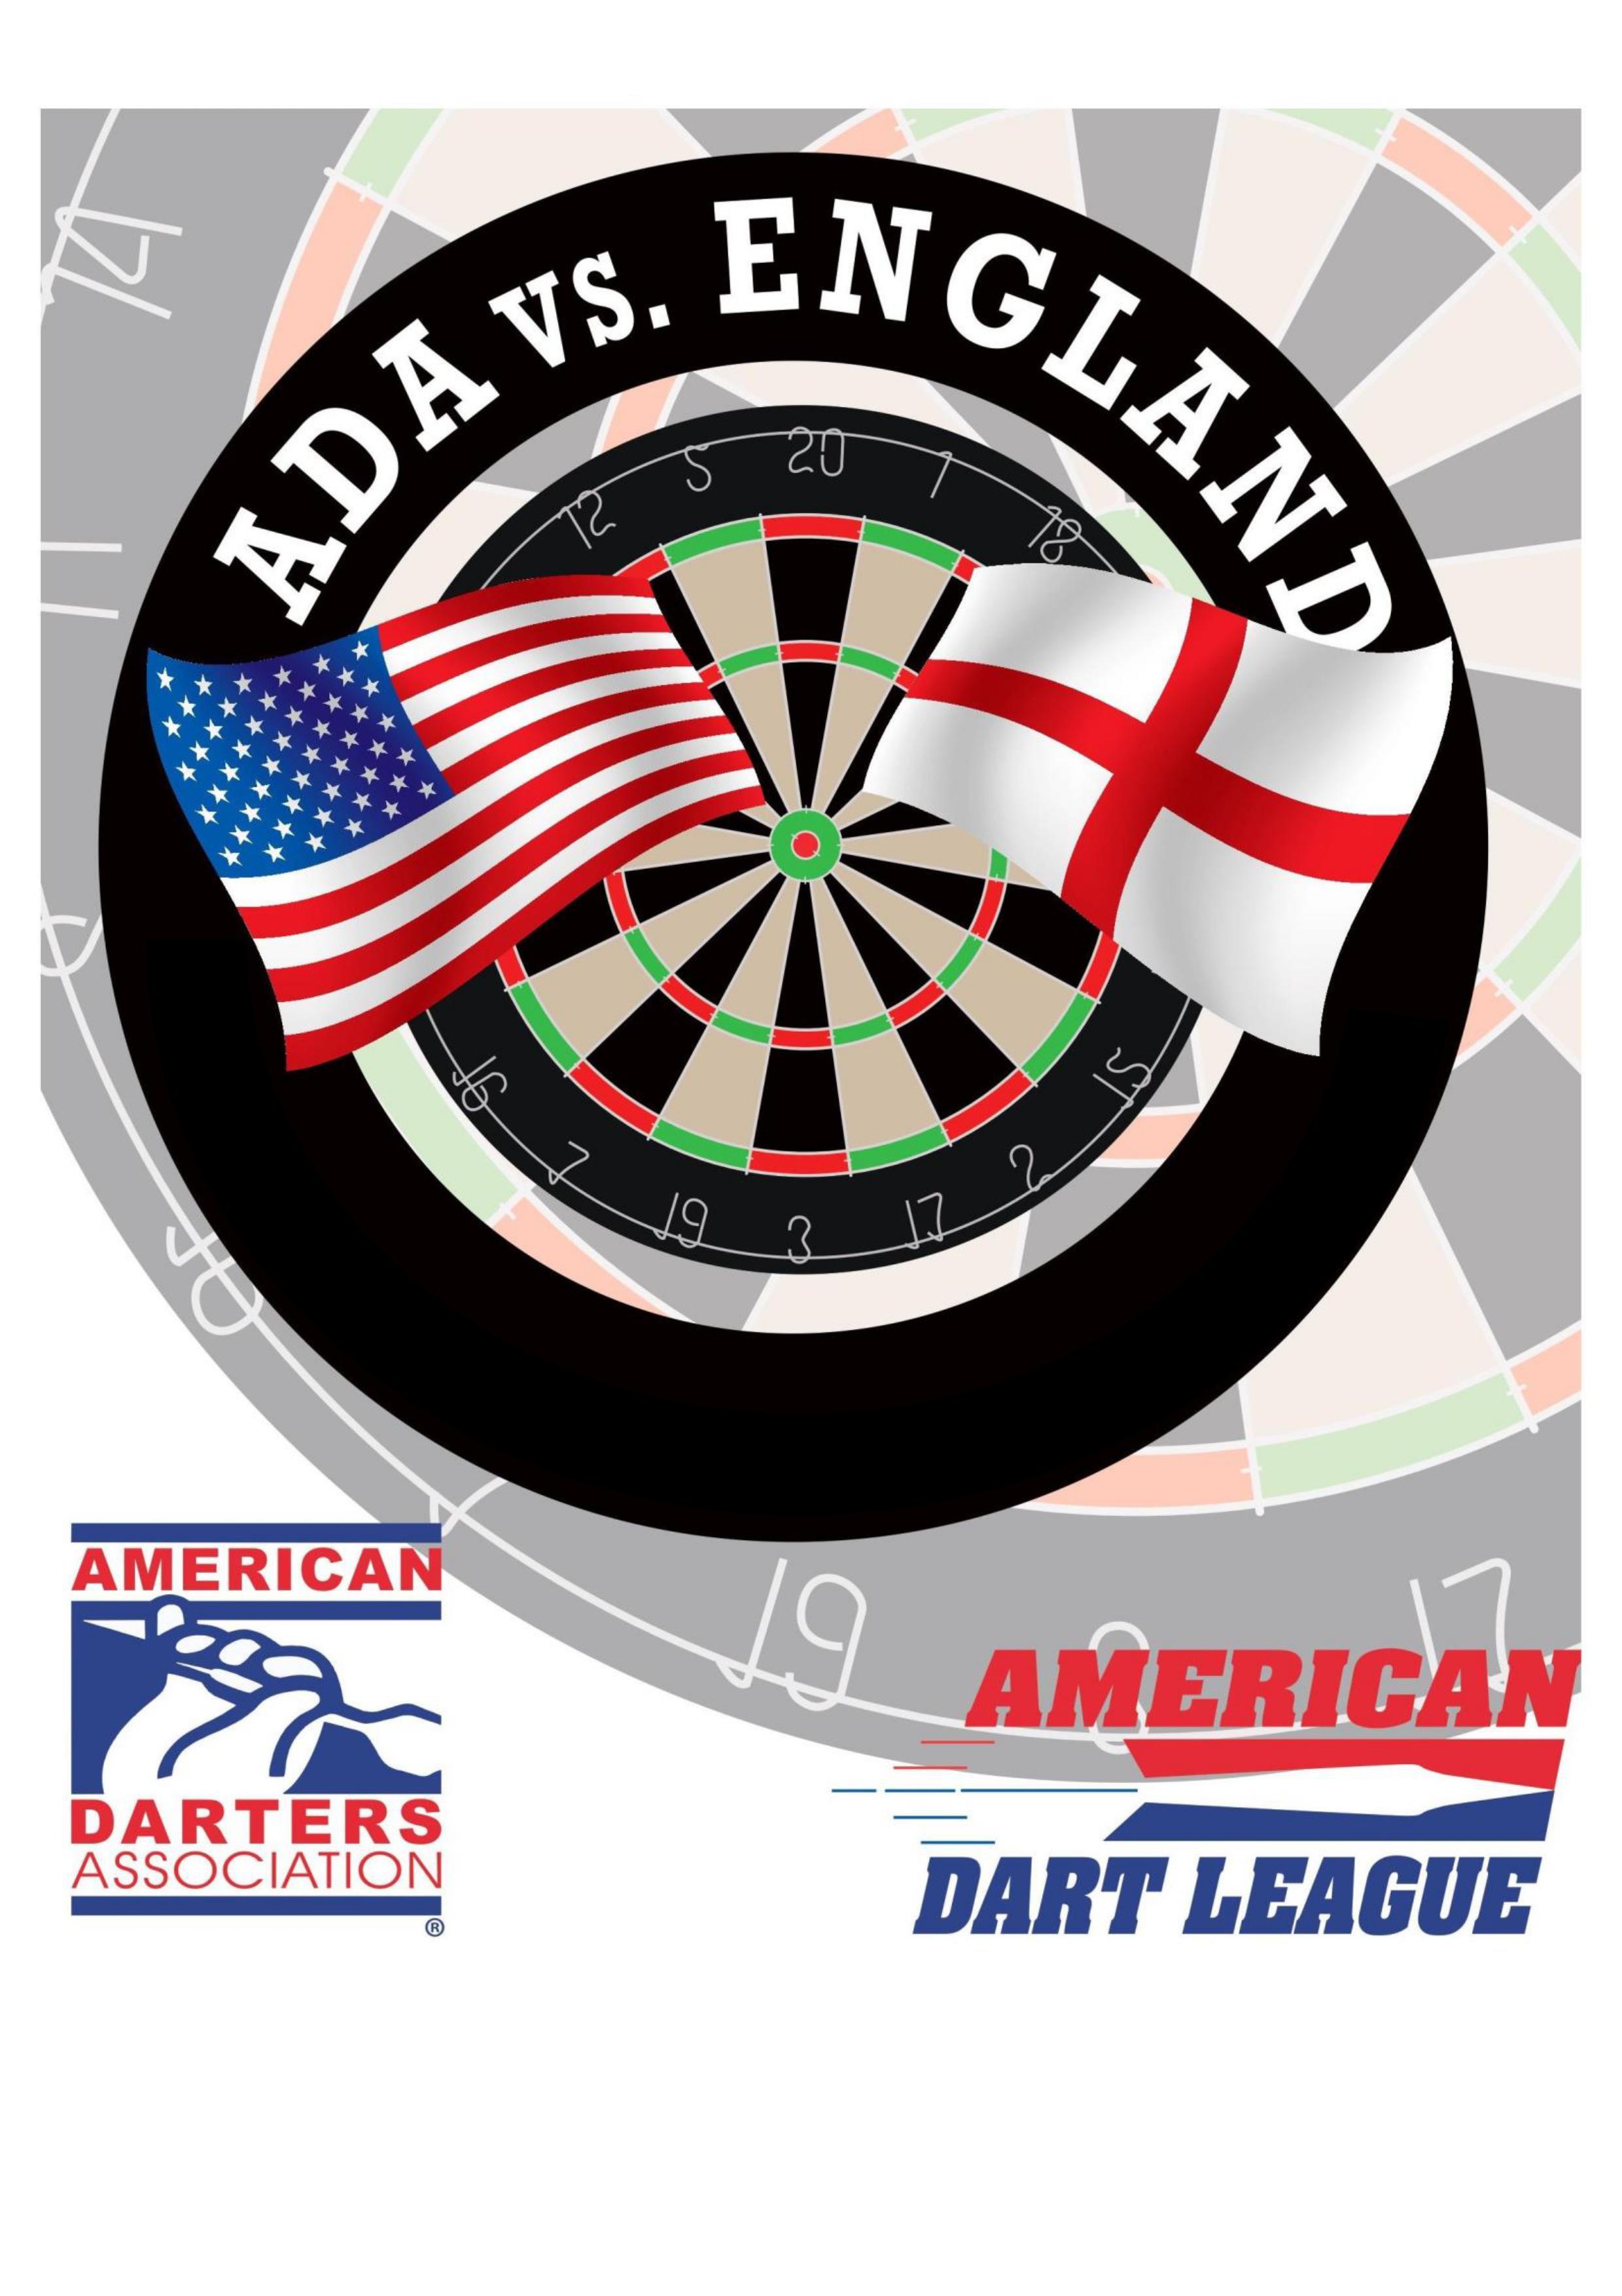 ADA Home - ADA - The American Darters Association